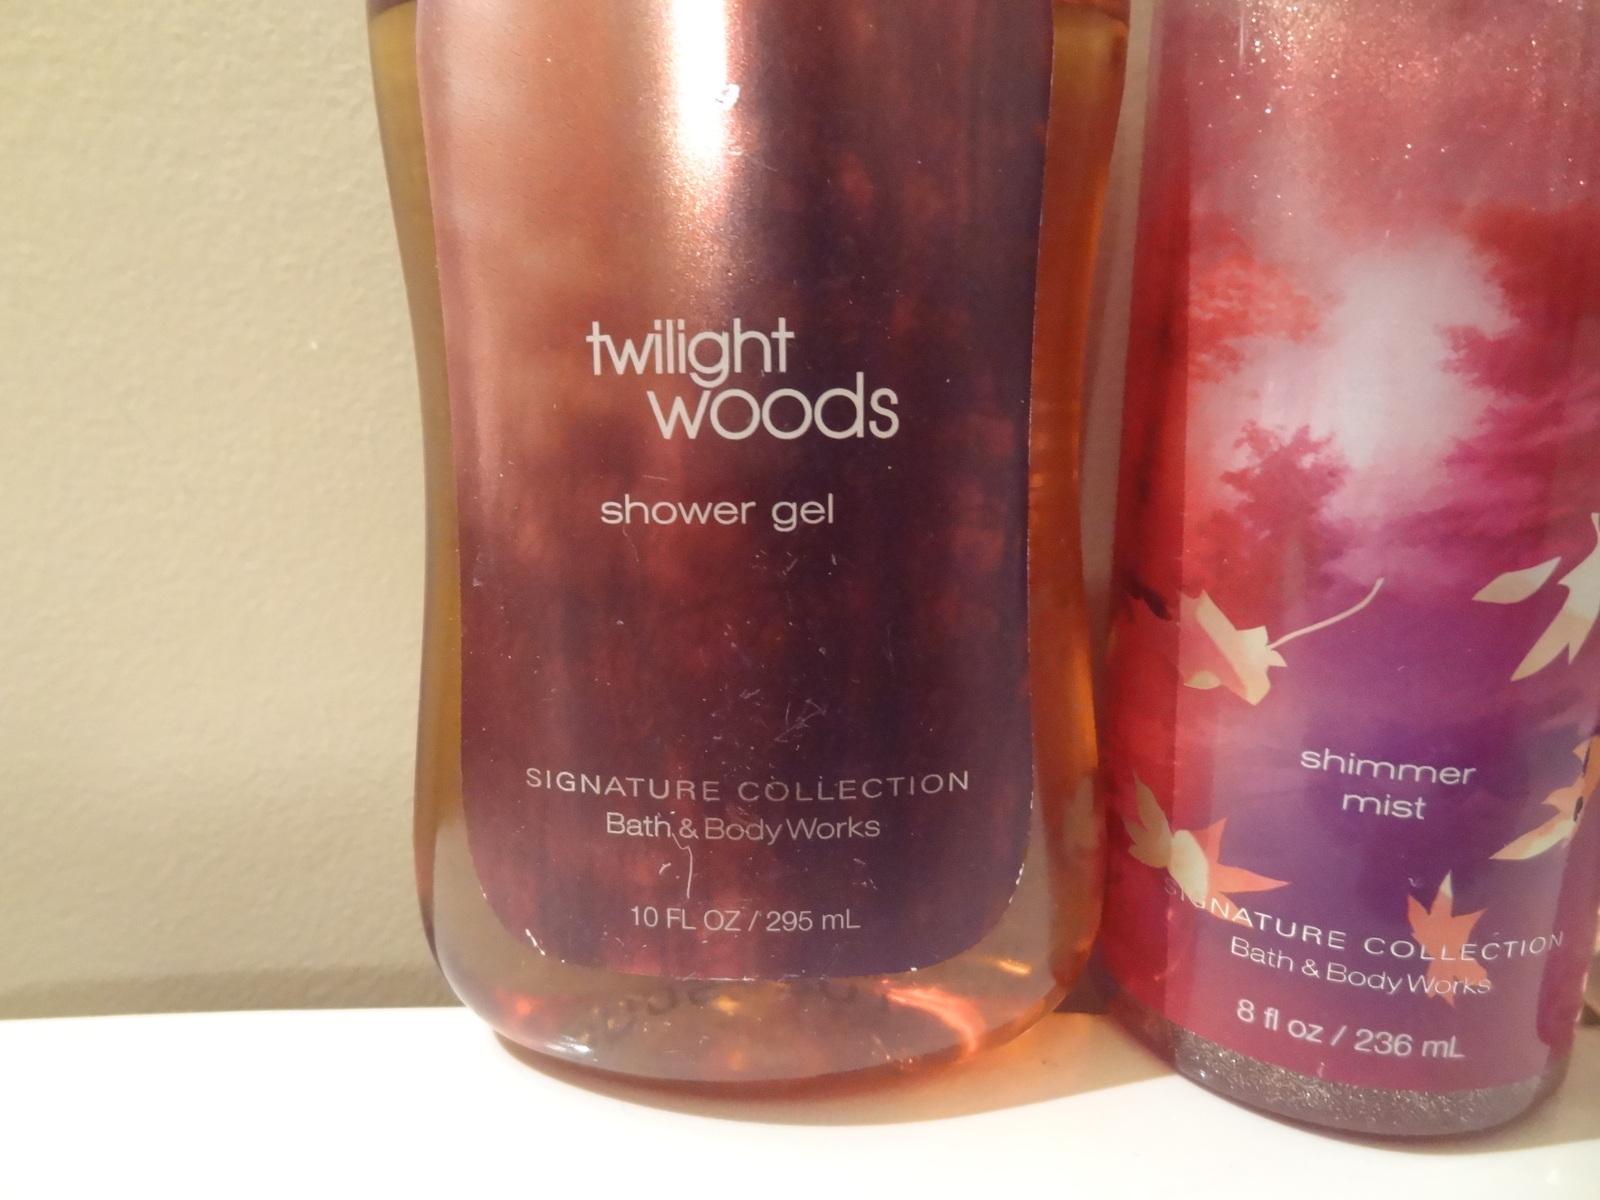 Bath Body Works Set Of 3 Twilight Woods And 50 Similar Items Spray For Men Shower Gel Shimmer Mist Perfume